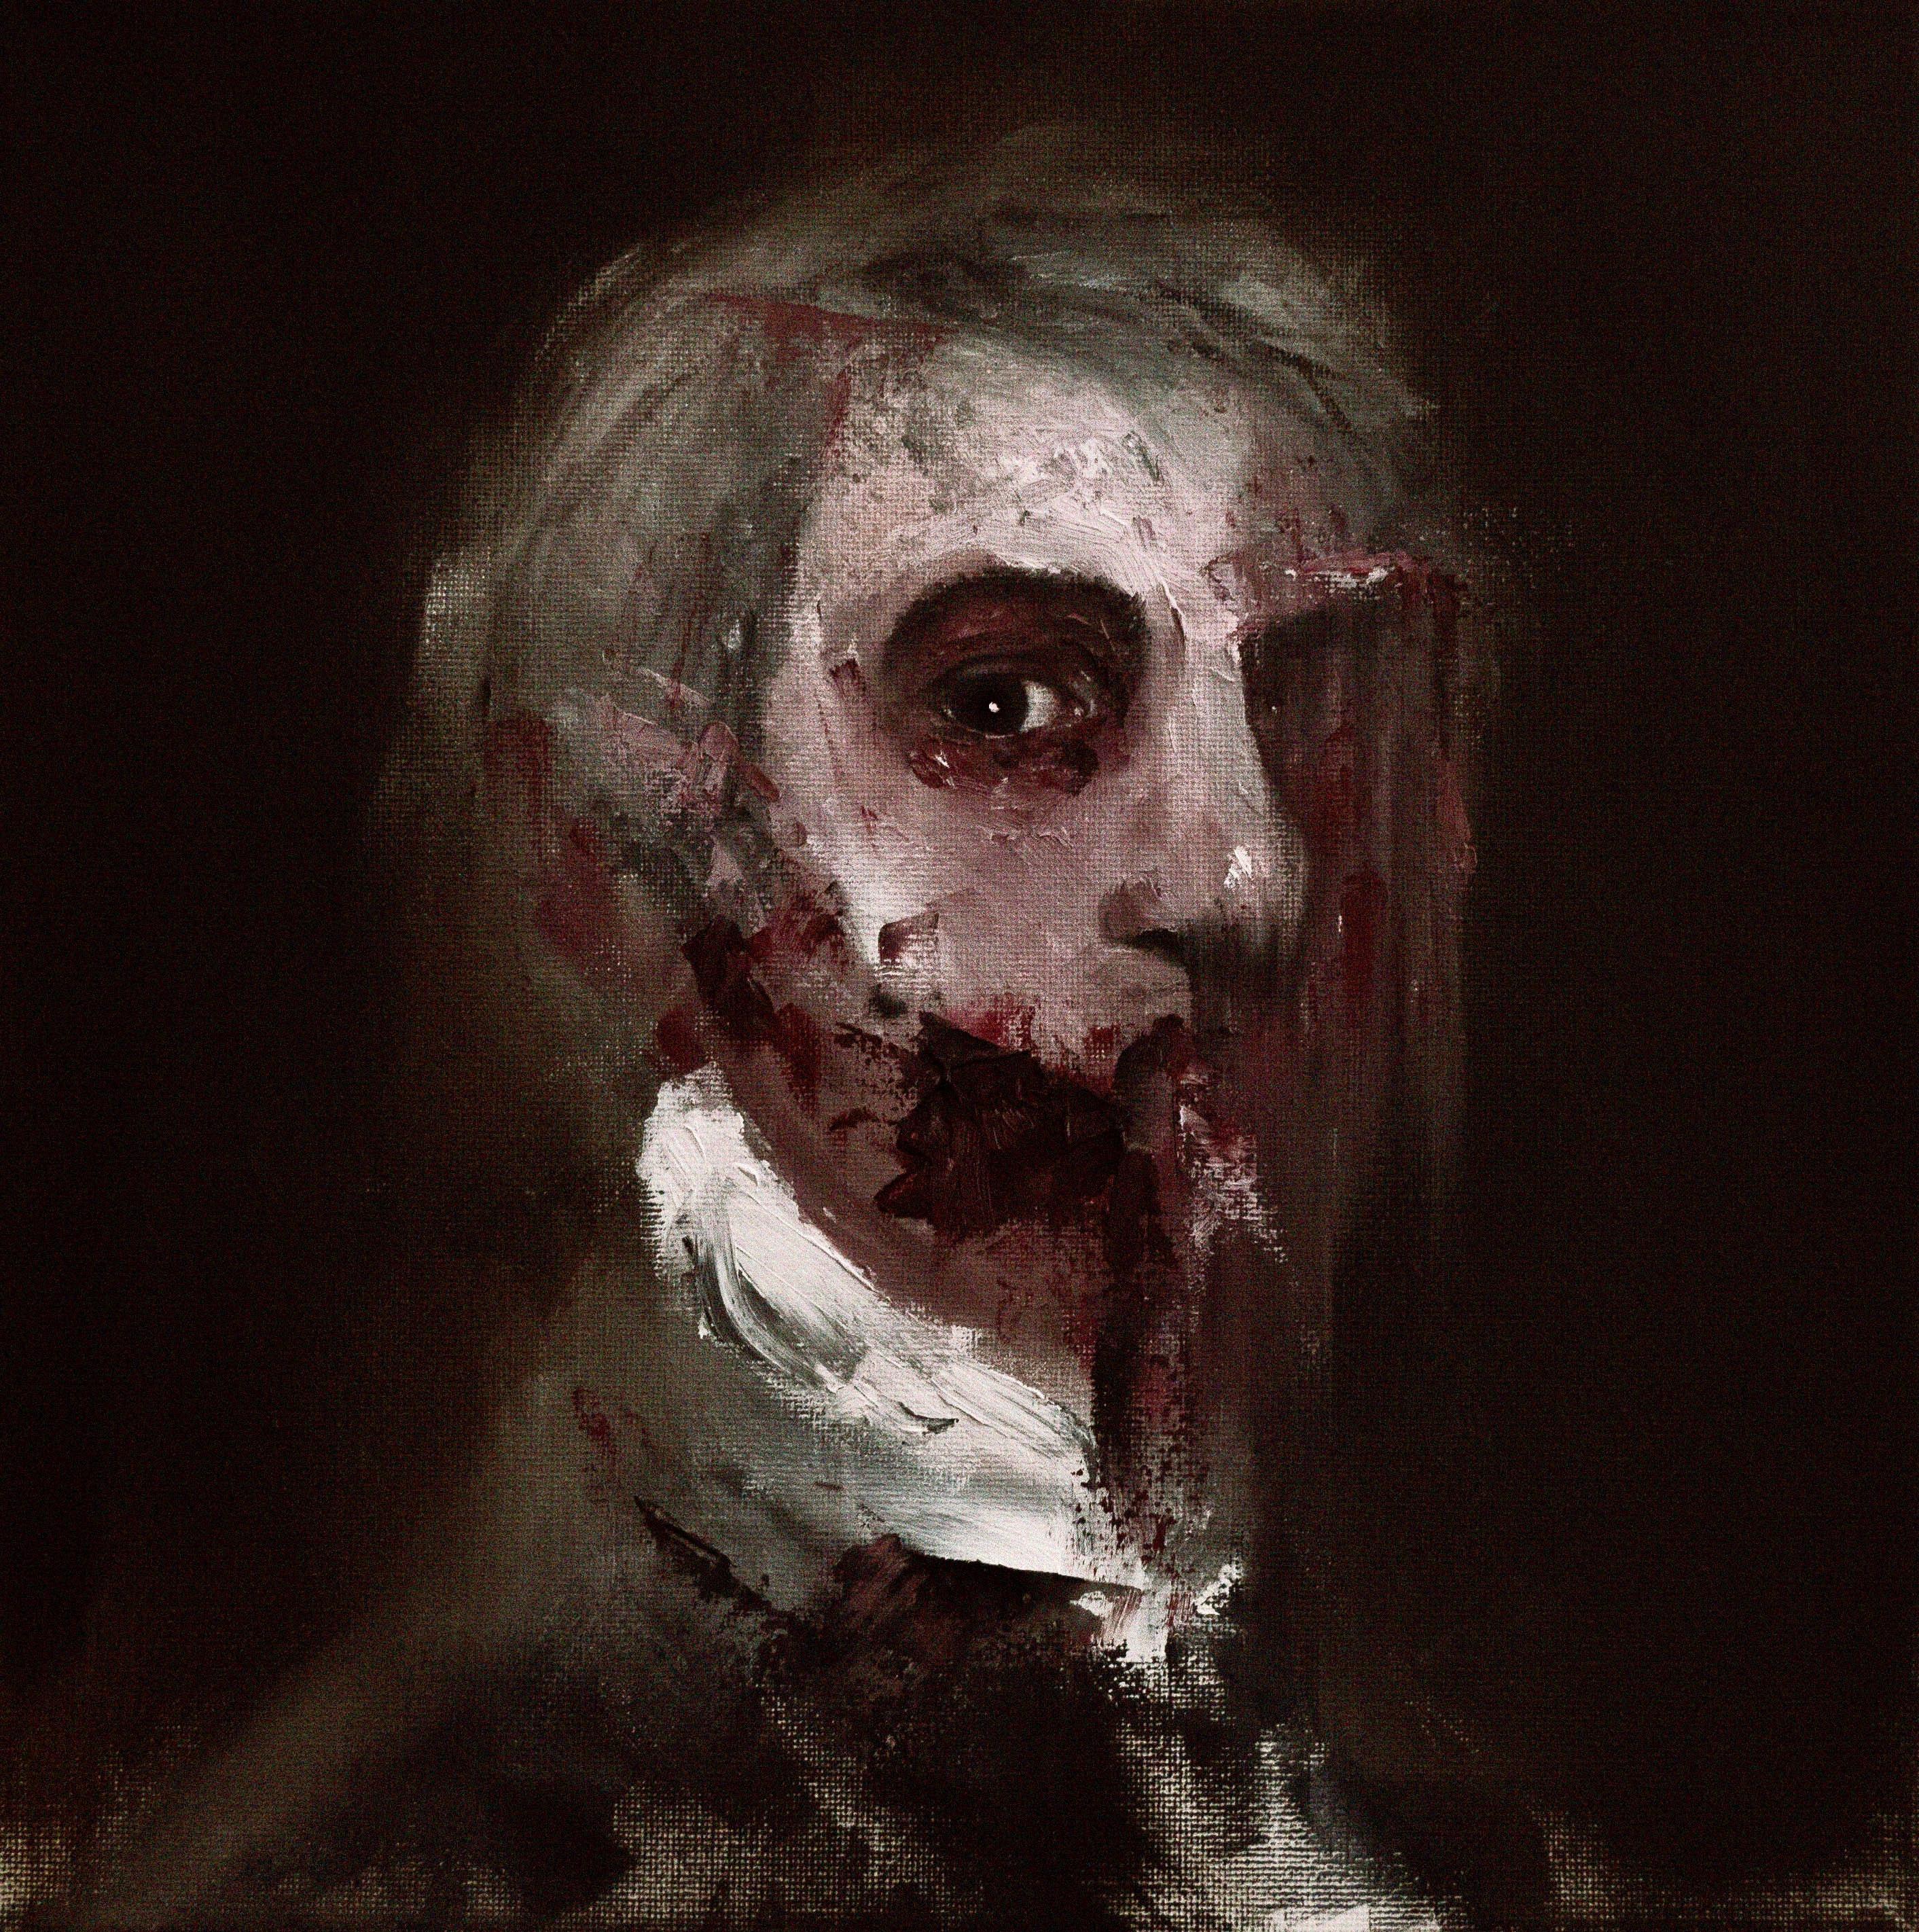 Nocturnal Man (Oils).